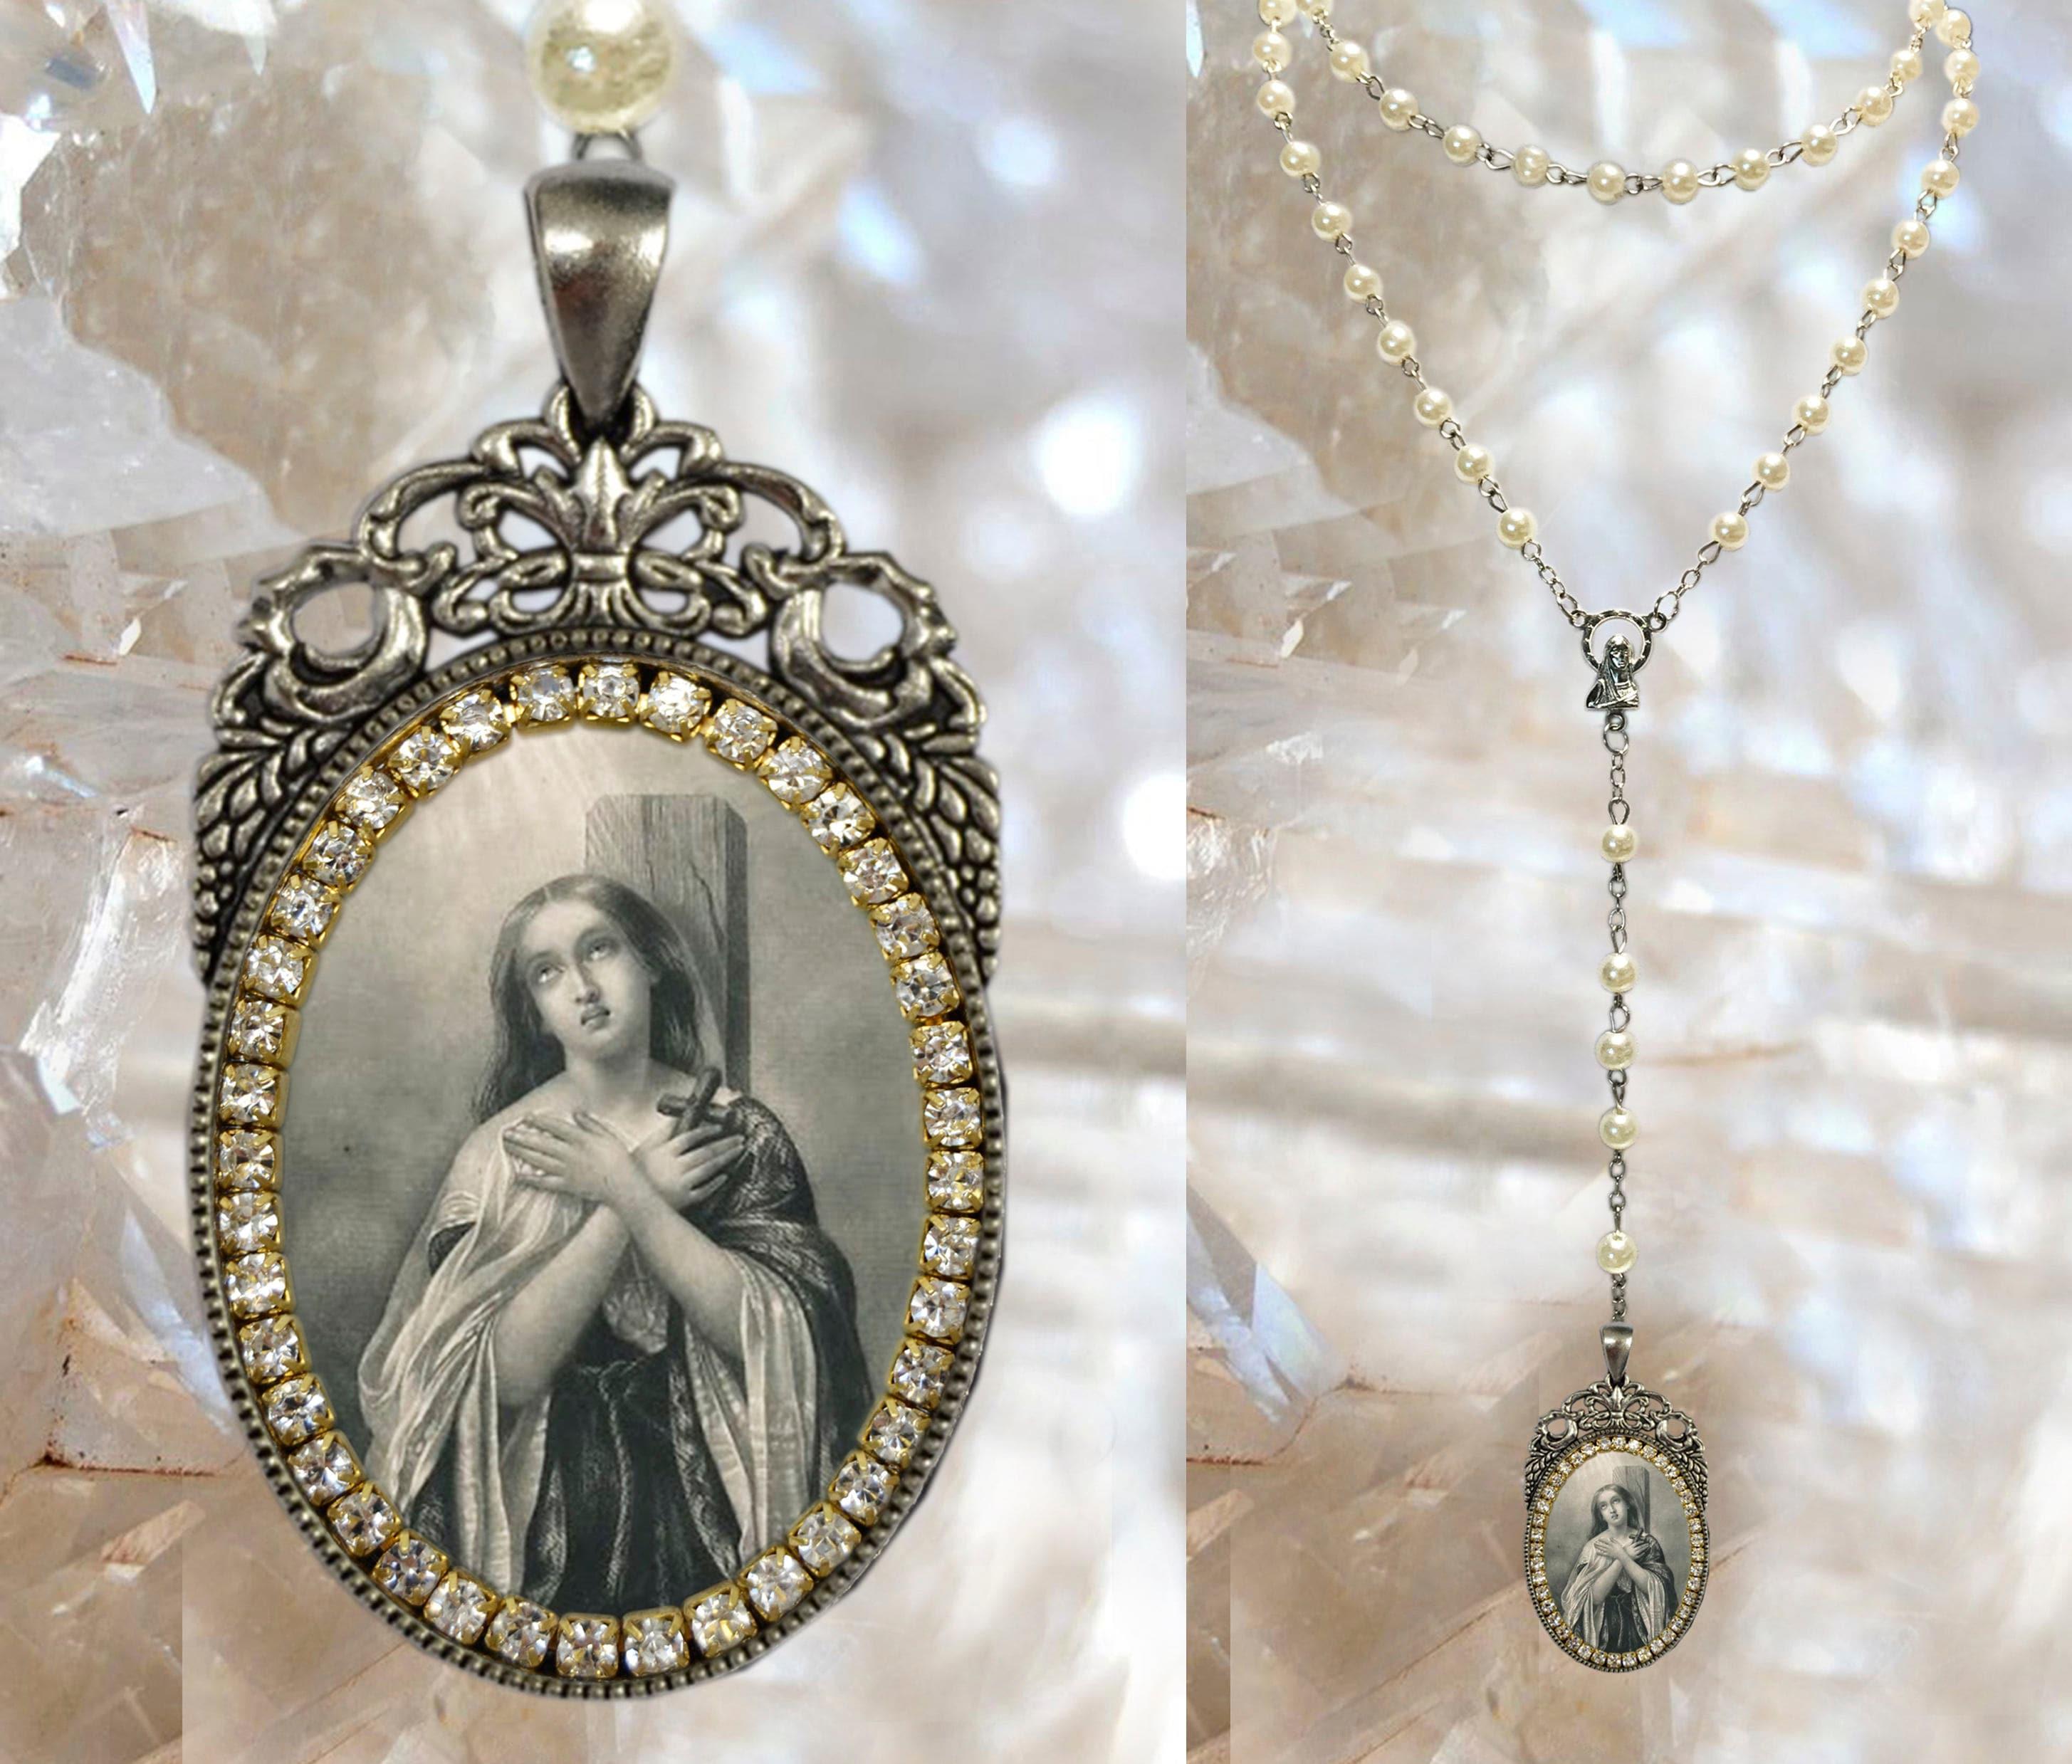 St joan of arc rosary handmade catholic religious jewelry pendant st joan of arc rosary handmade catholic religious jewelry pendant the maid of orlanssainte jeanne darc la pucelle dorlans aloadofball Gallery